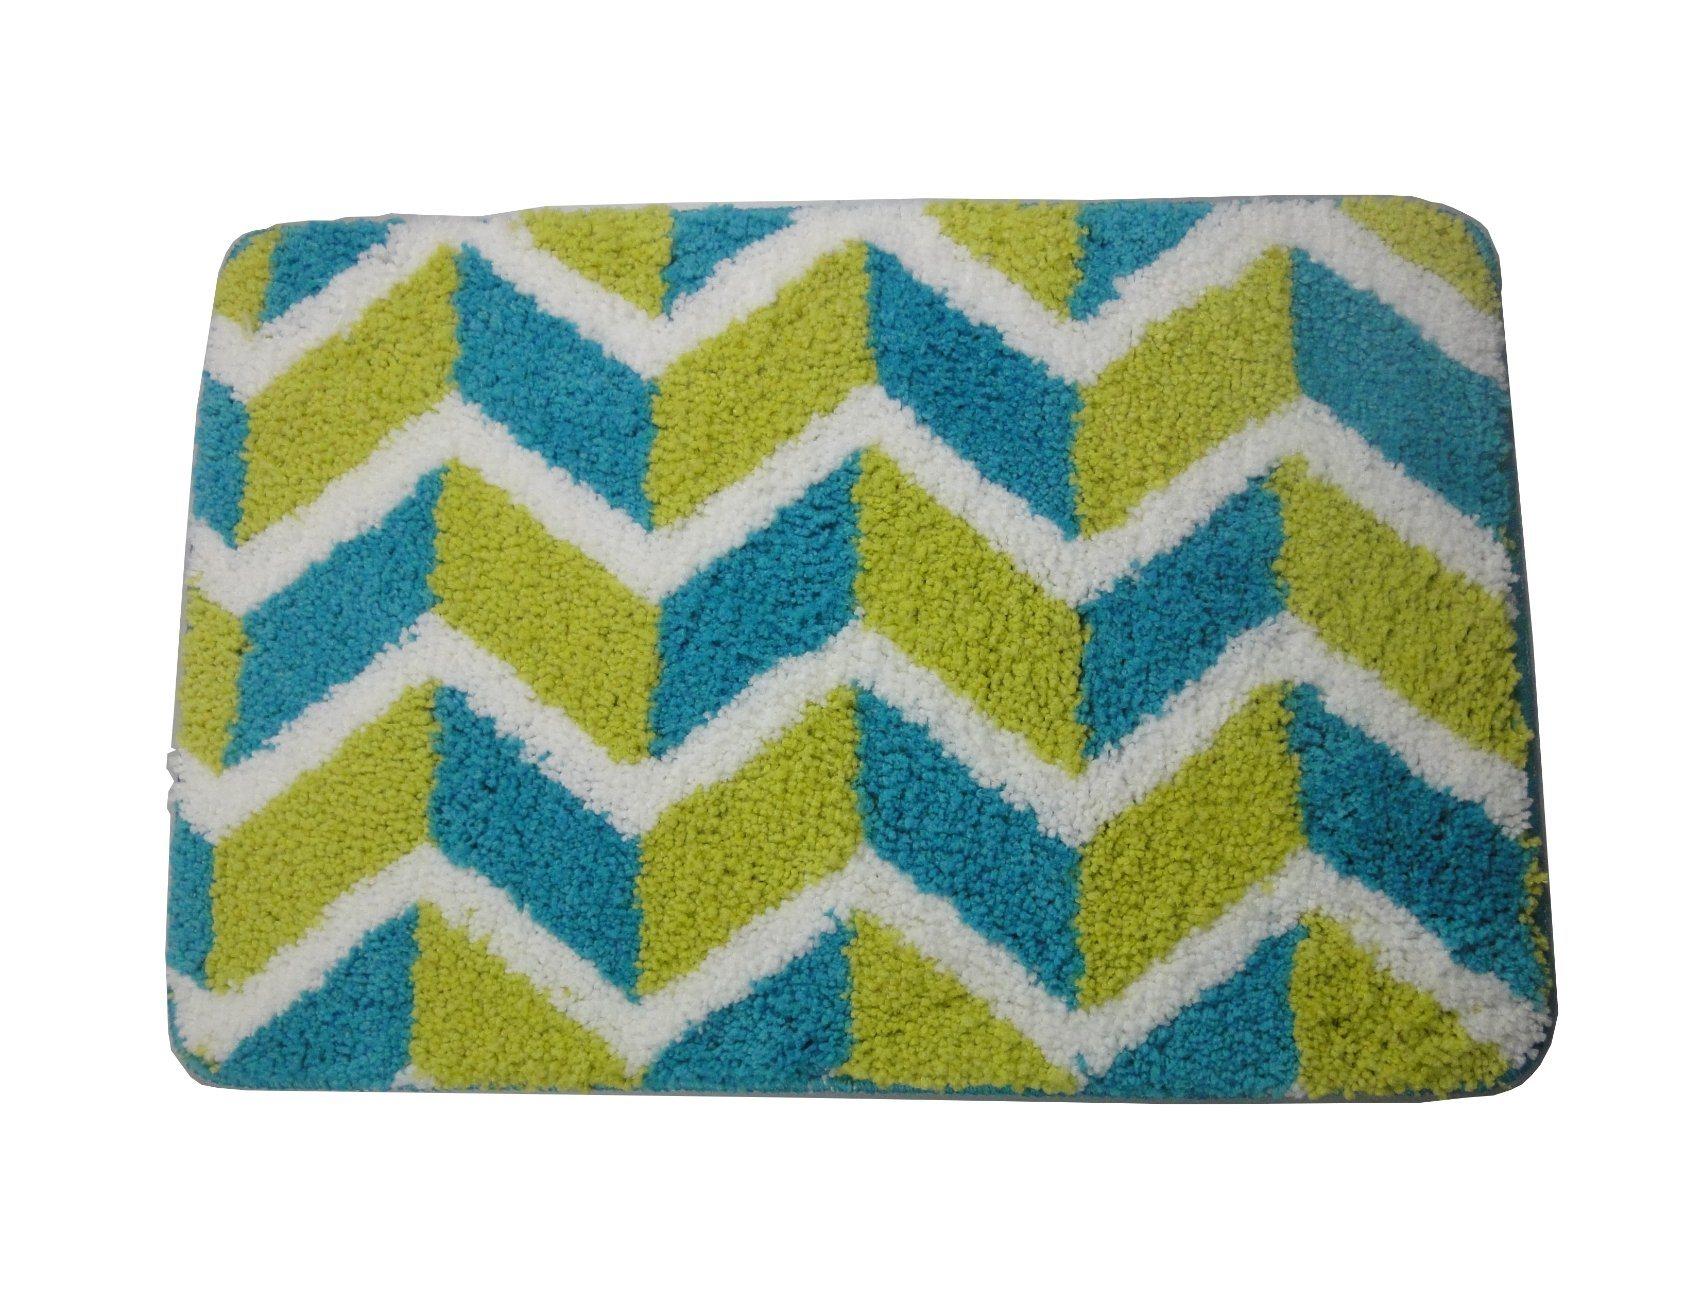 China Design Bathroom Rug Non-Slip Bath Mat for Floors Green & Cream ...